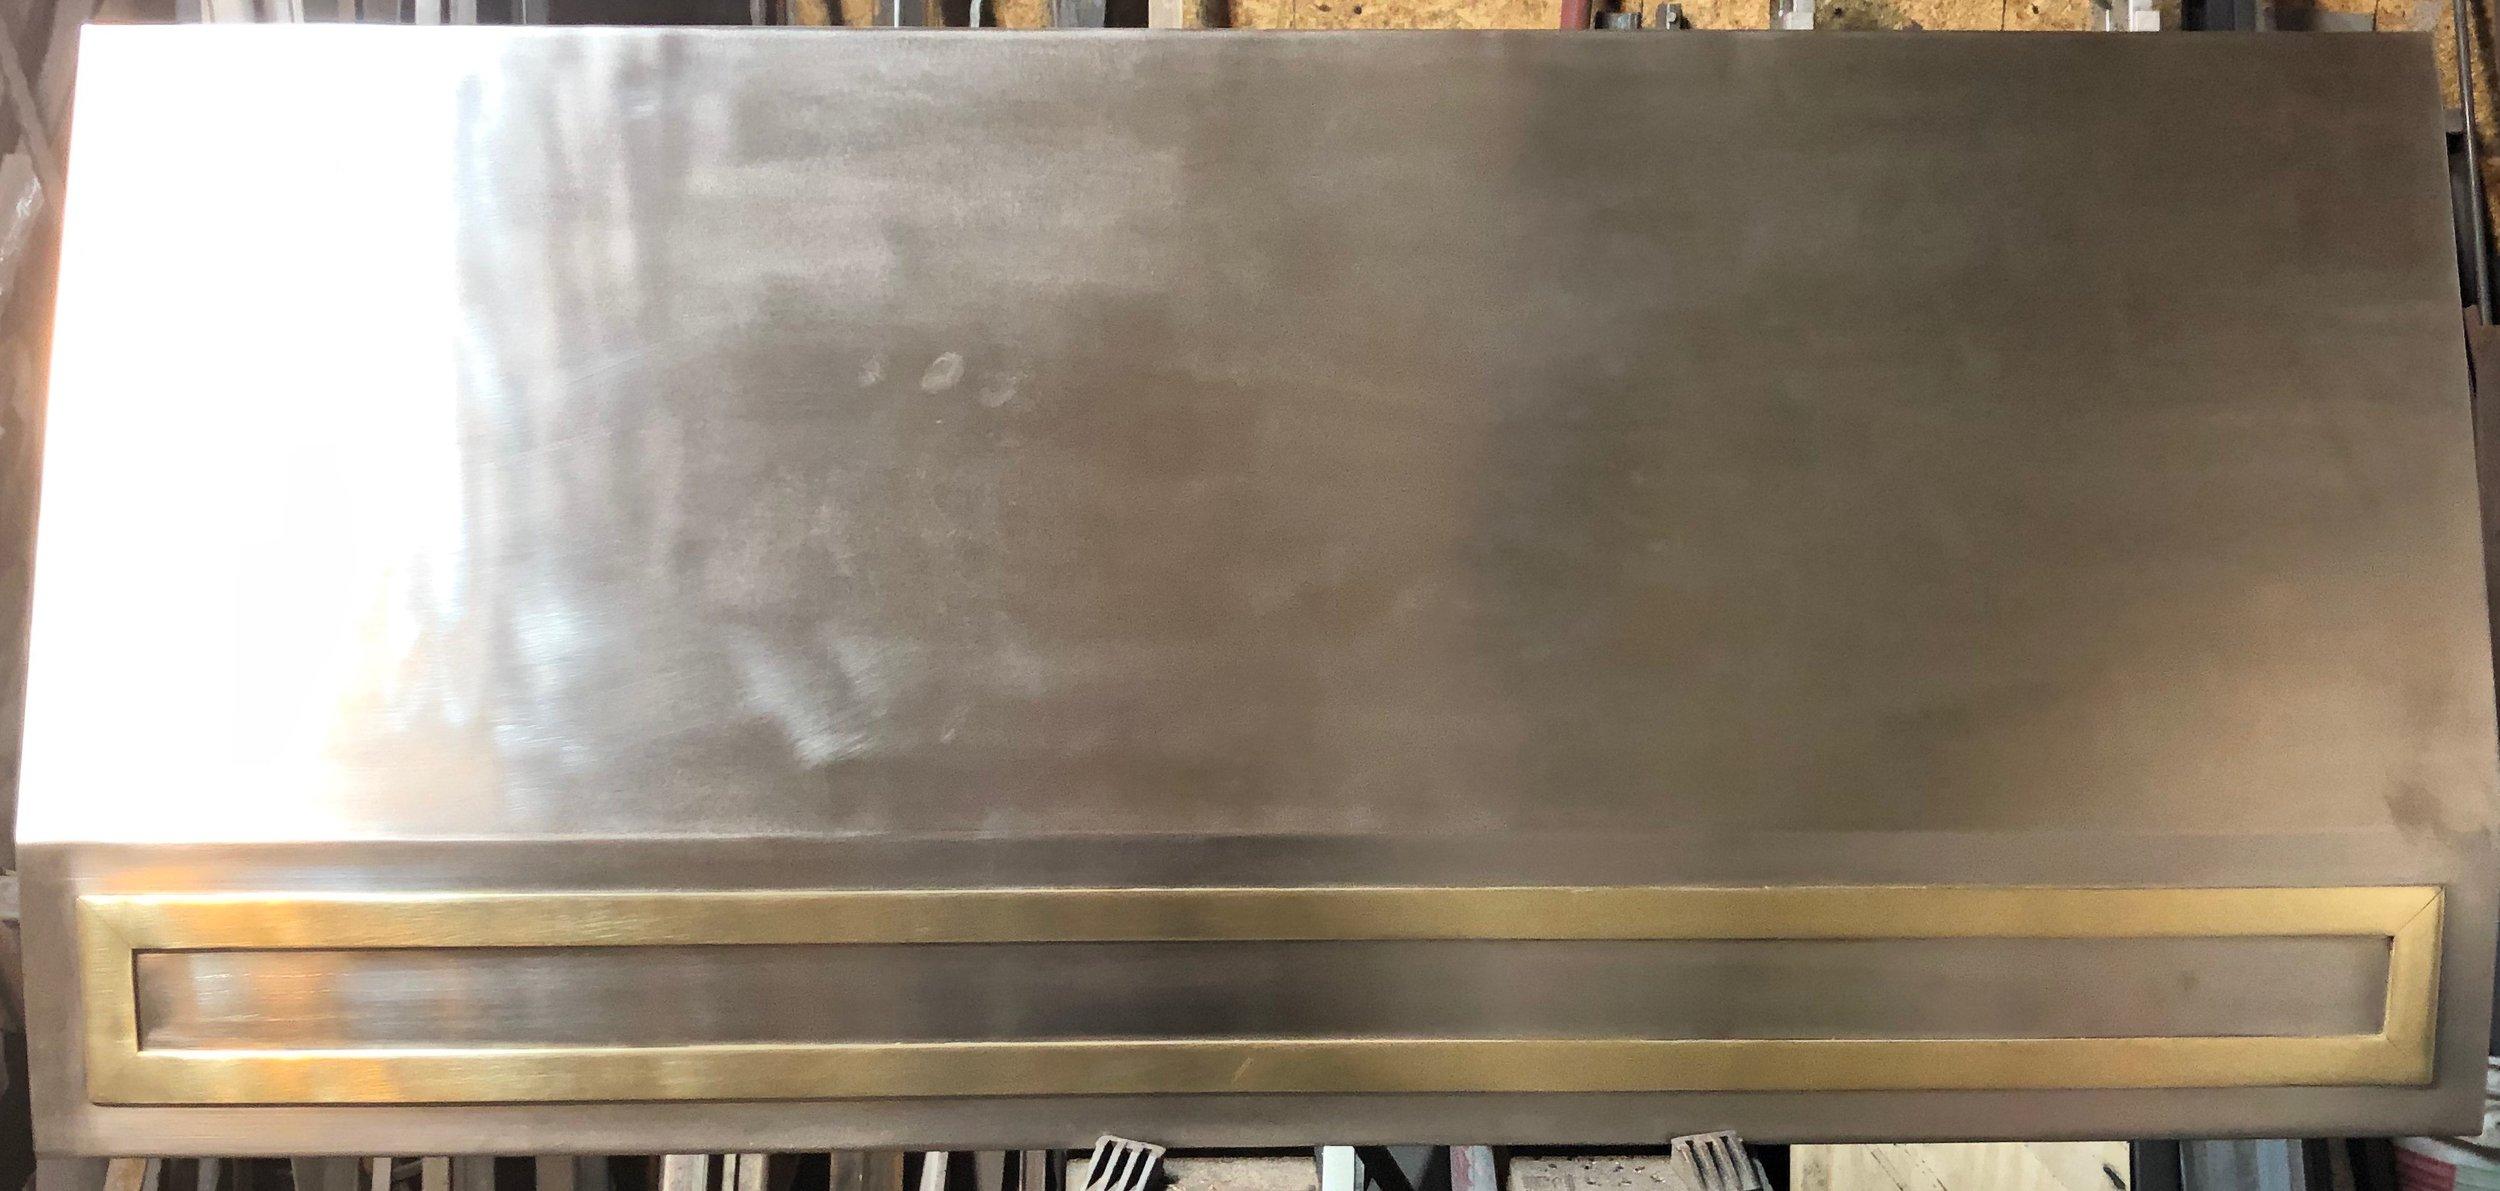 stainless steel & brass kitchen hood